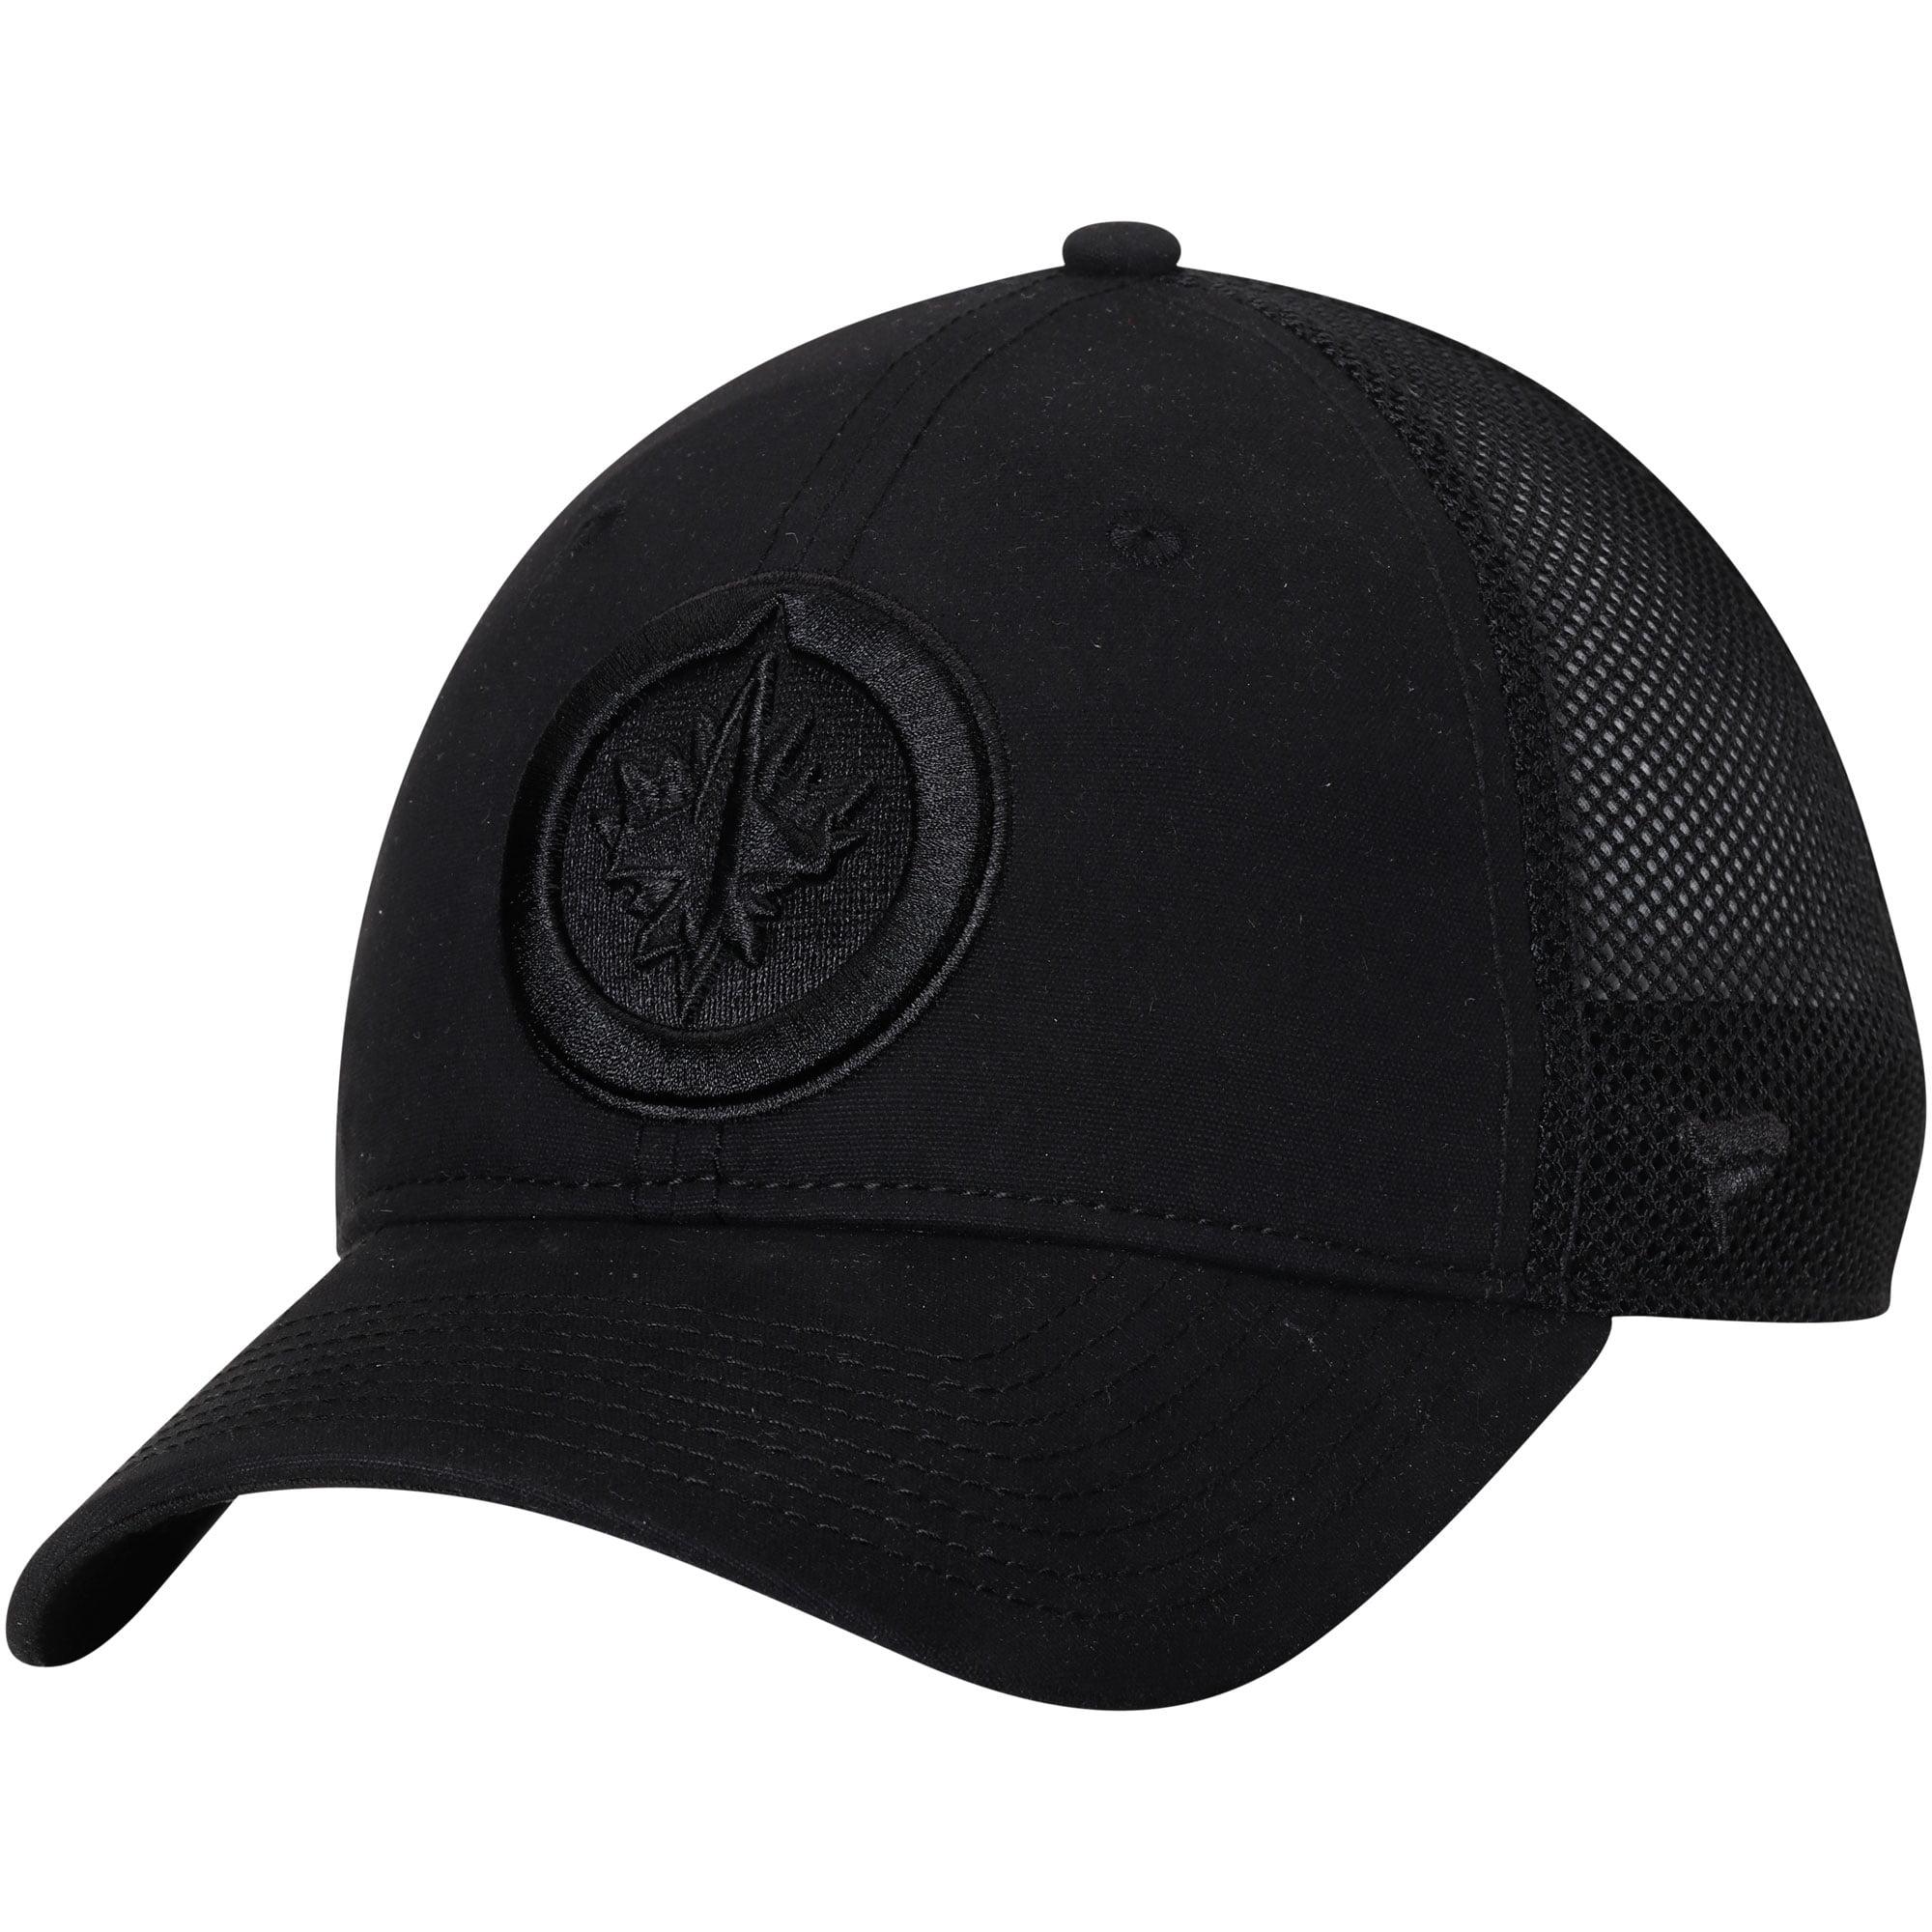 Winnipeg Jets Fanatics Branded Indestructible Blackout Trucker Adjustable Snapback Hat - Black - OSFA